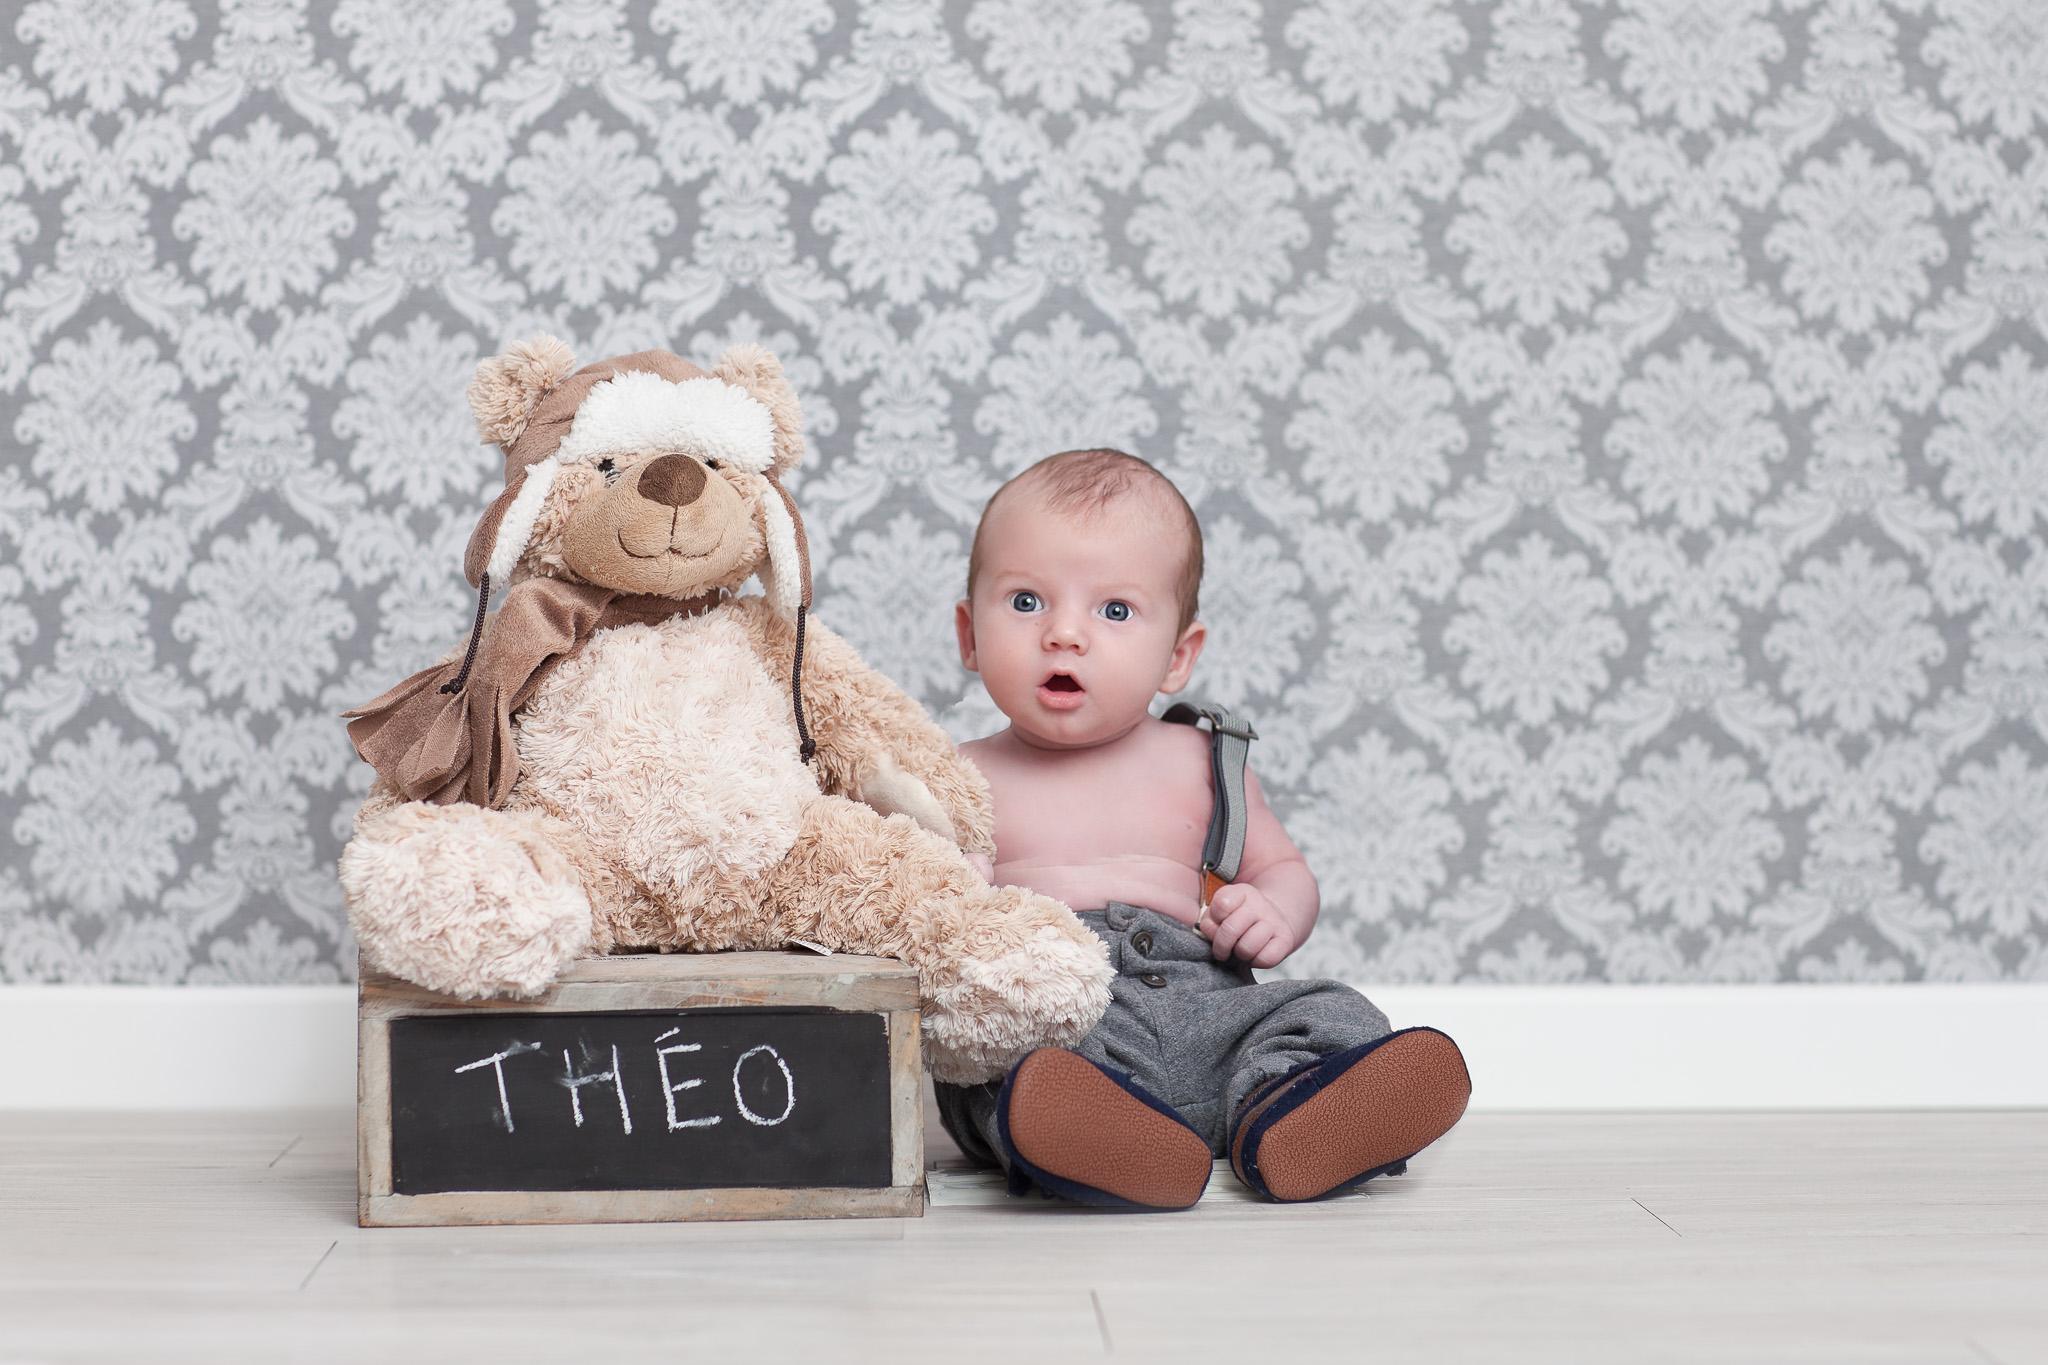 Theo J.